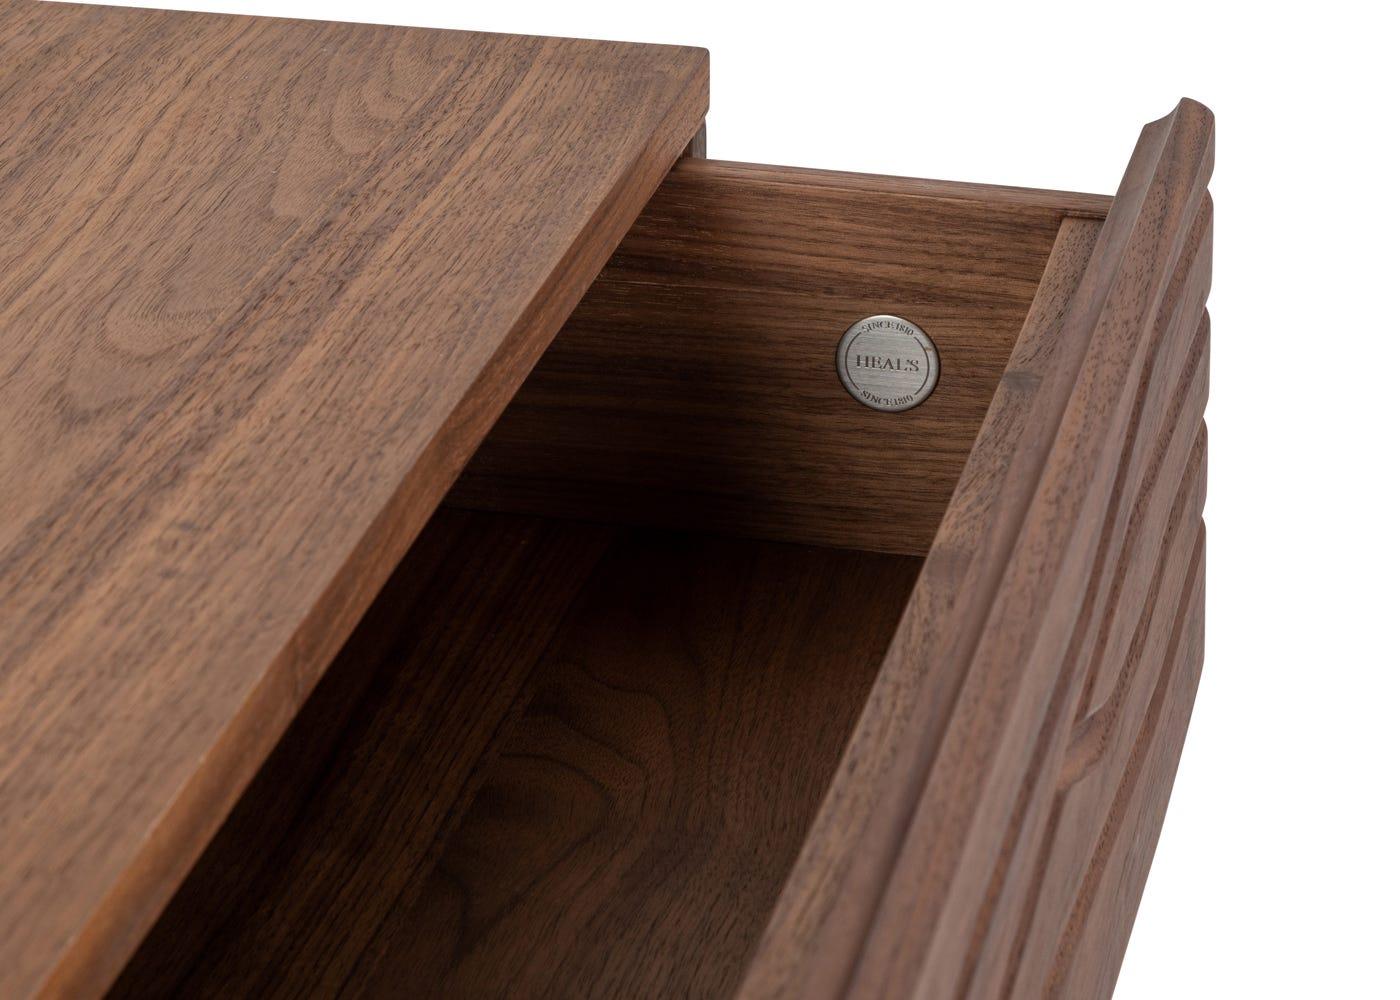 As shown: Storage drawer.